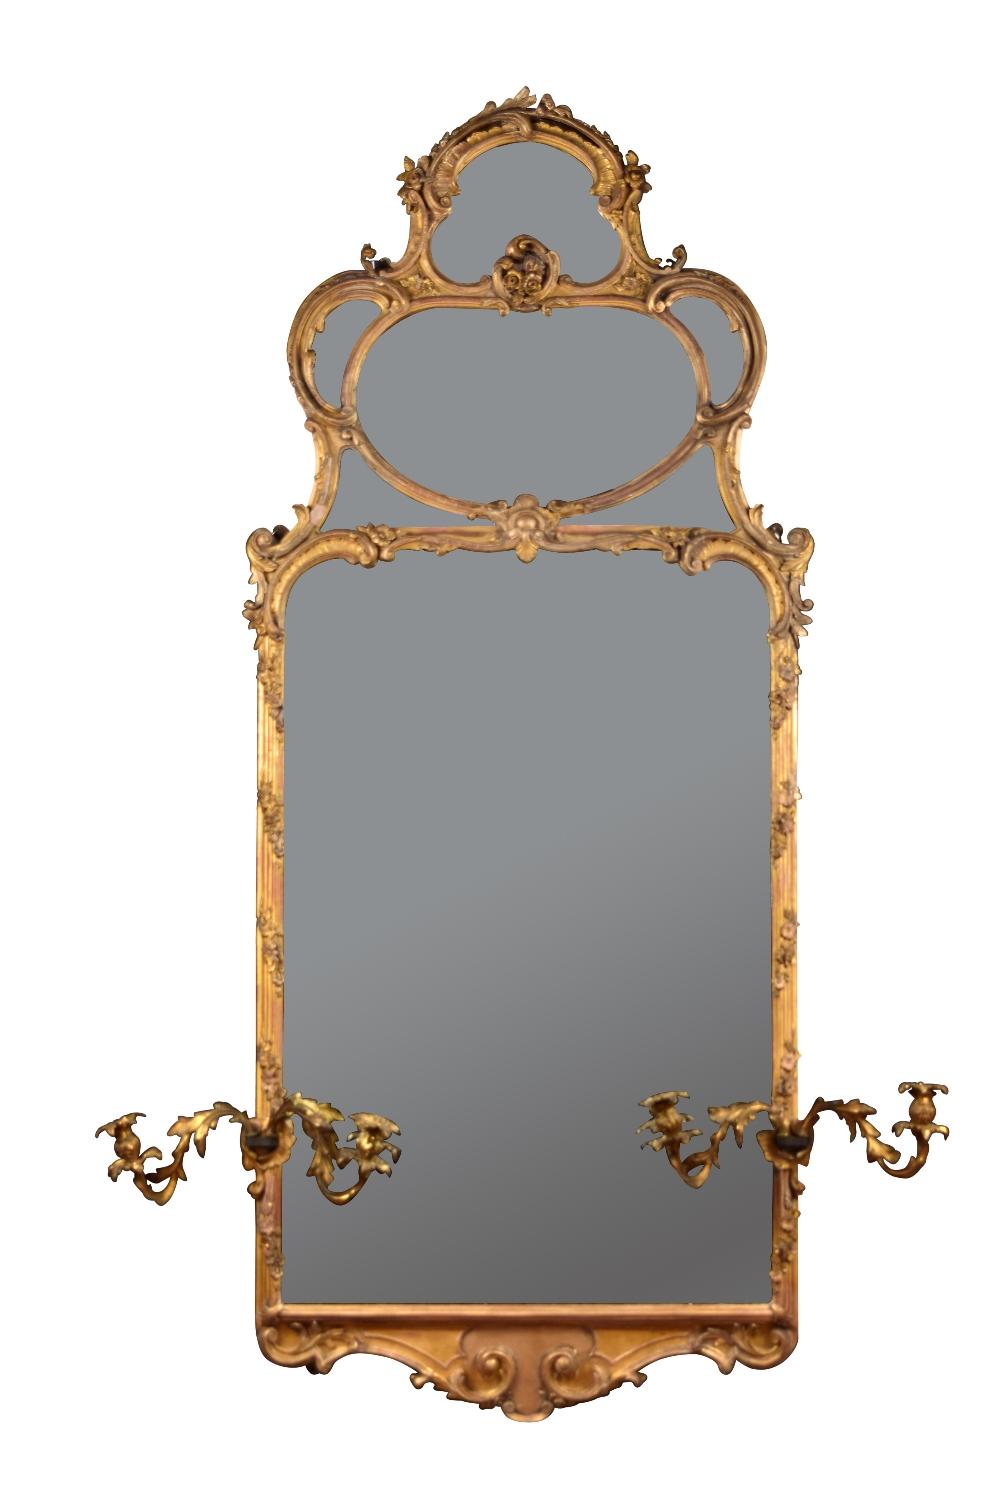 Fine Quality Original Large Antique Gilt Pier Wall Mirror With Cast Gilt Brass Candle Sconces Charlecotes Original Oak Flooring